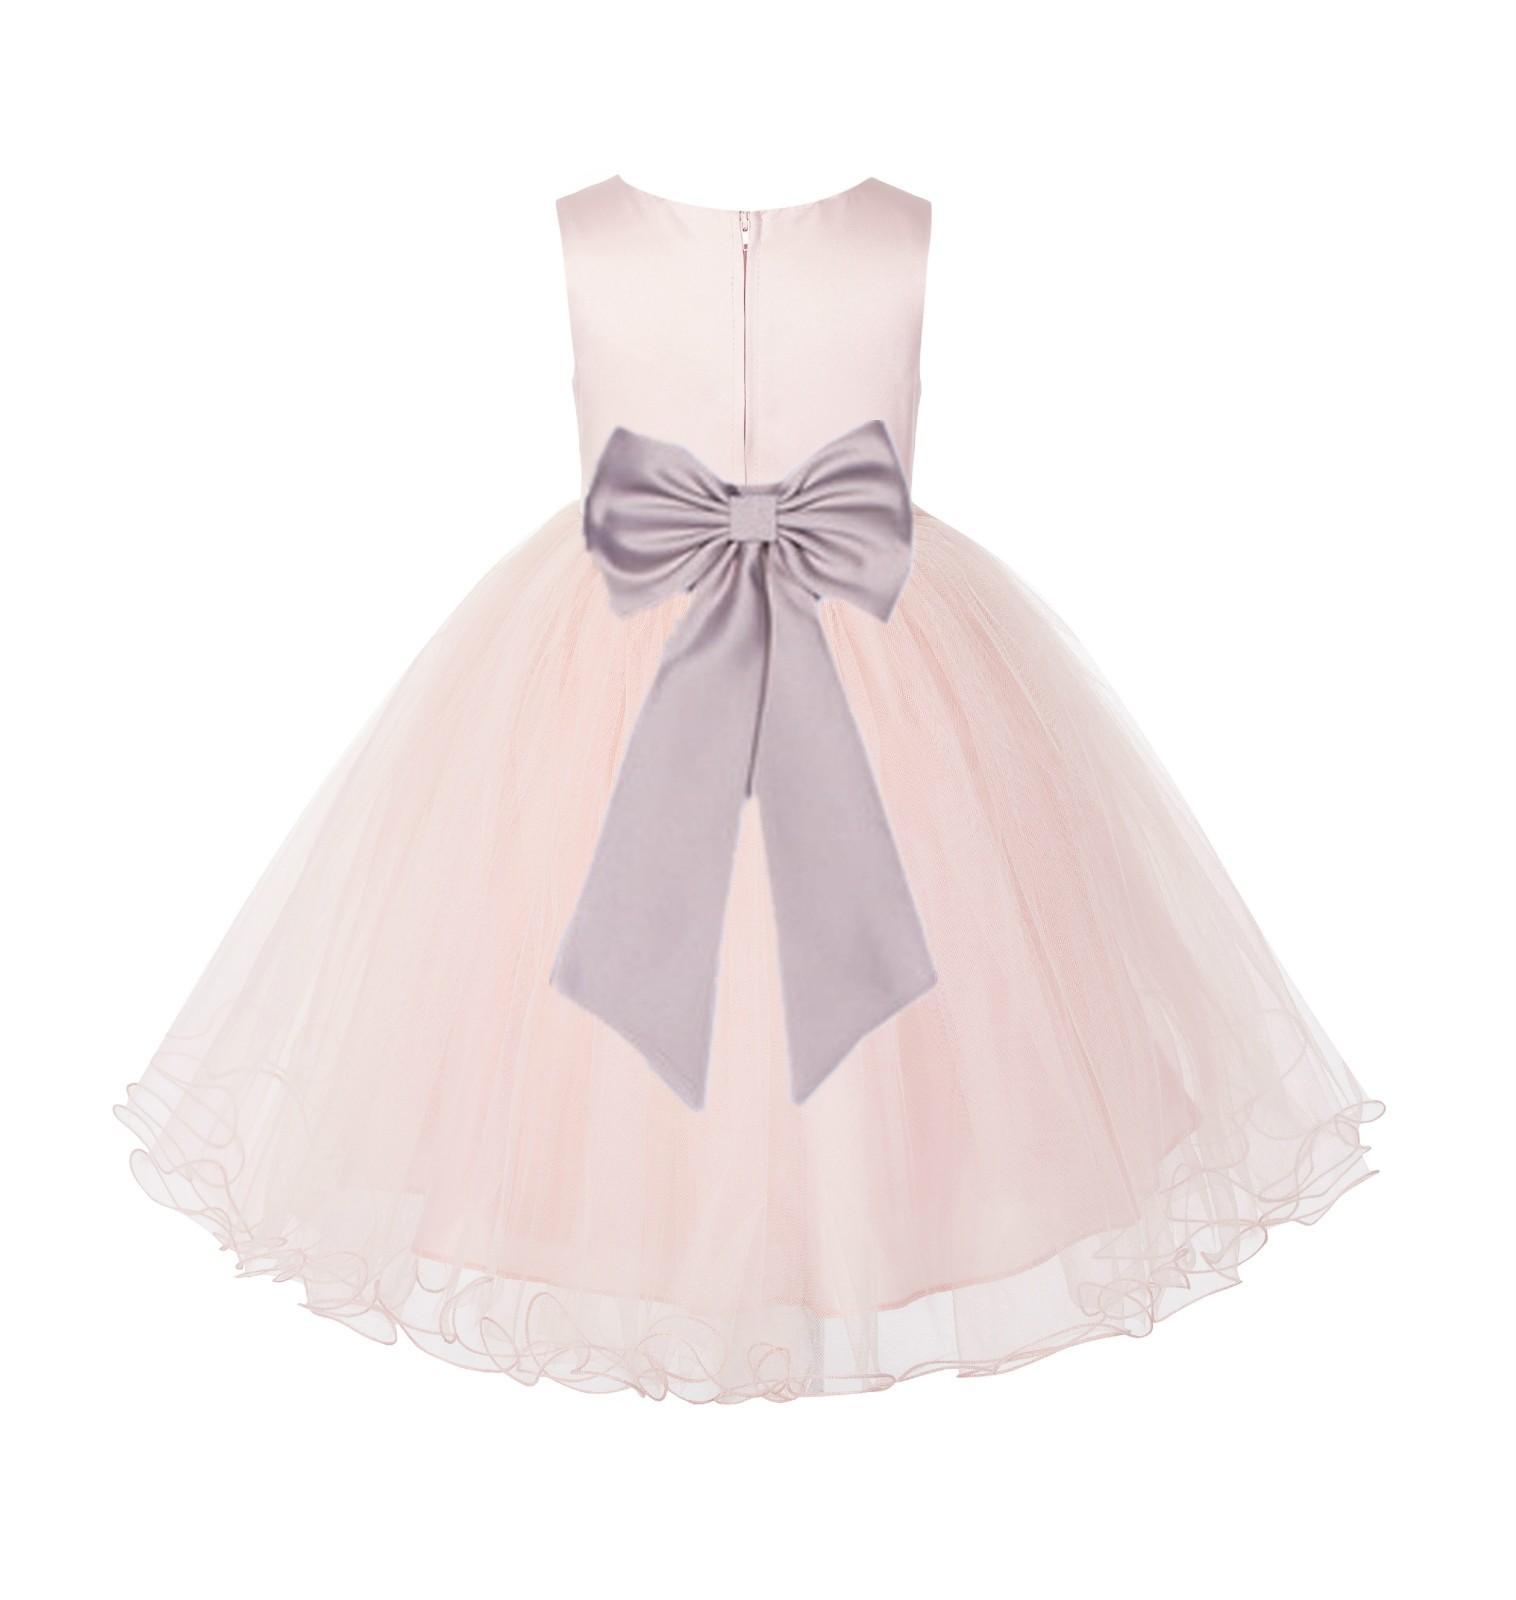 Blush PInk / Biscotti Tulle Rattail Edge Flower Girl Dress Wedding Bridesmaid 829T